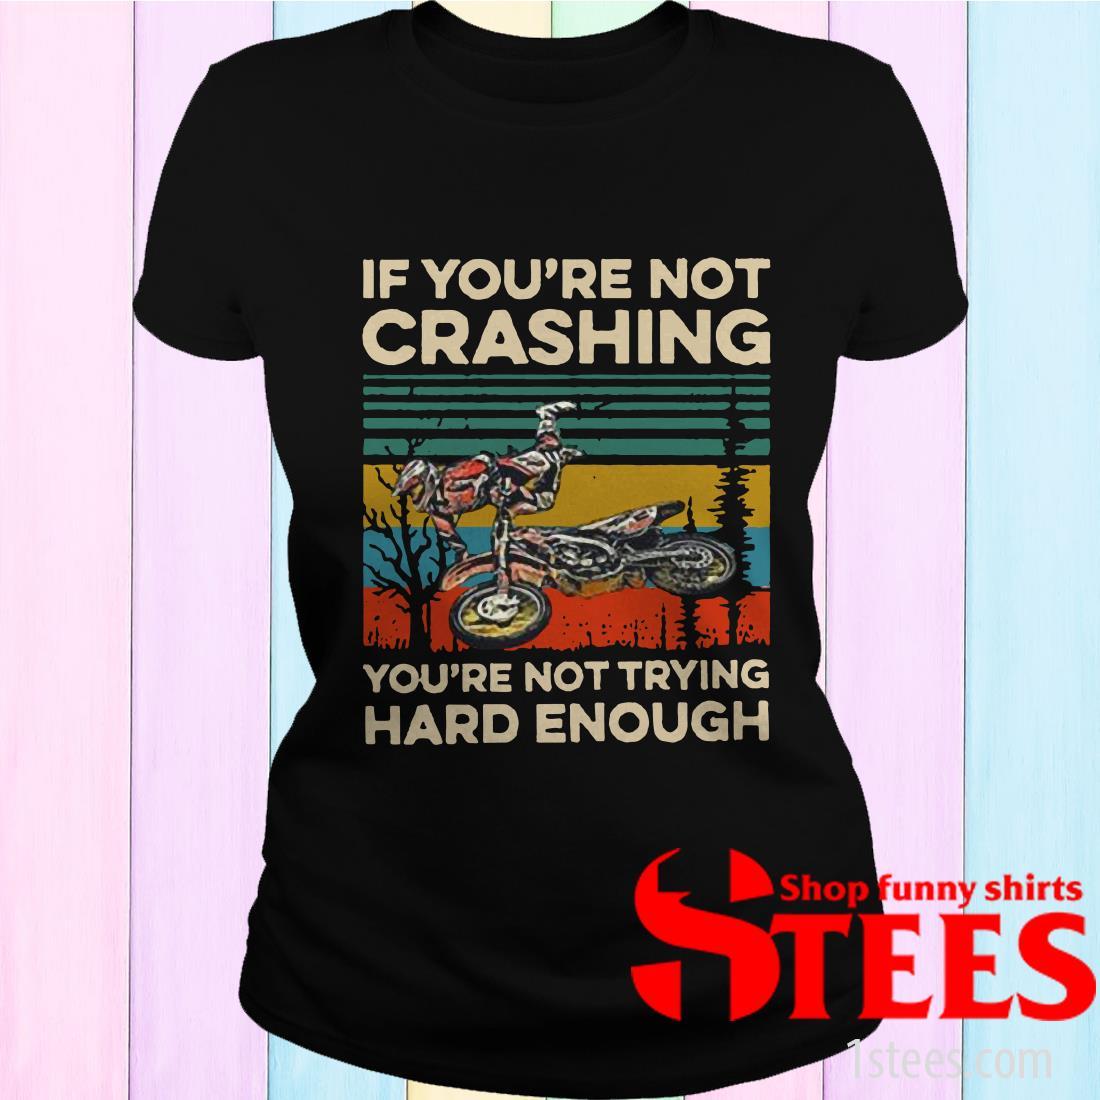 Vintage If You're Not Crashing You're Not Trying Hard Enough Shirt